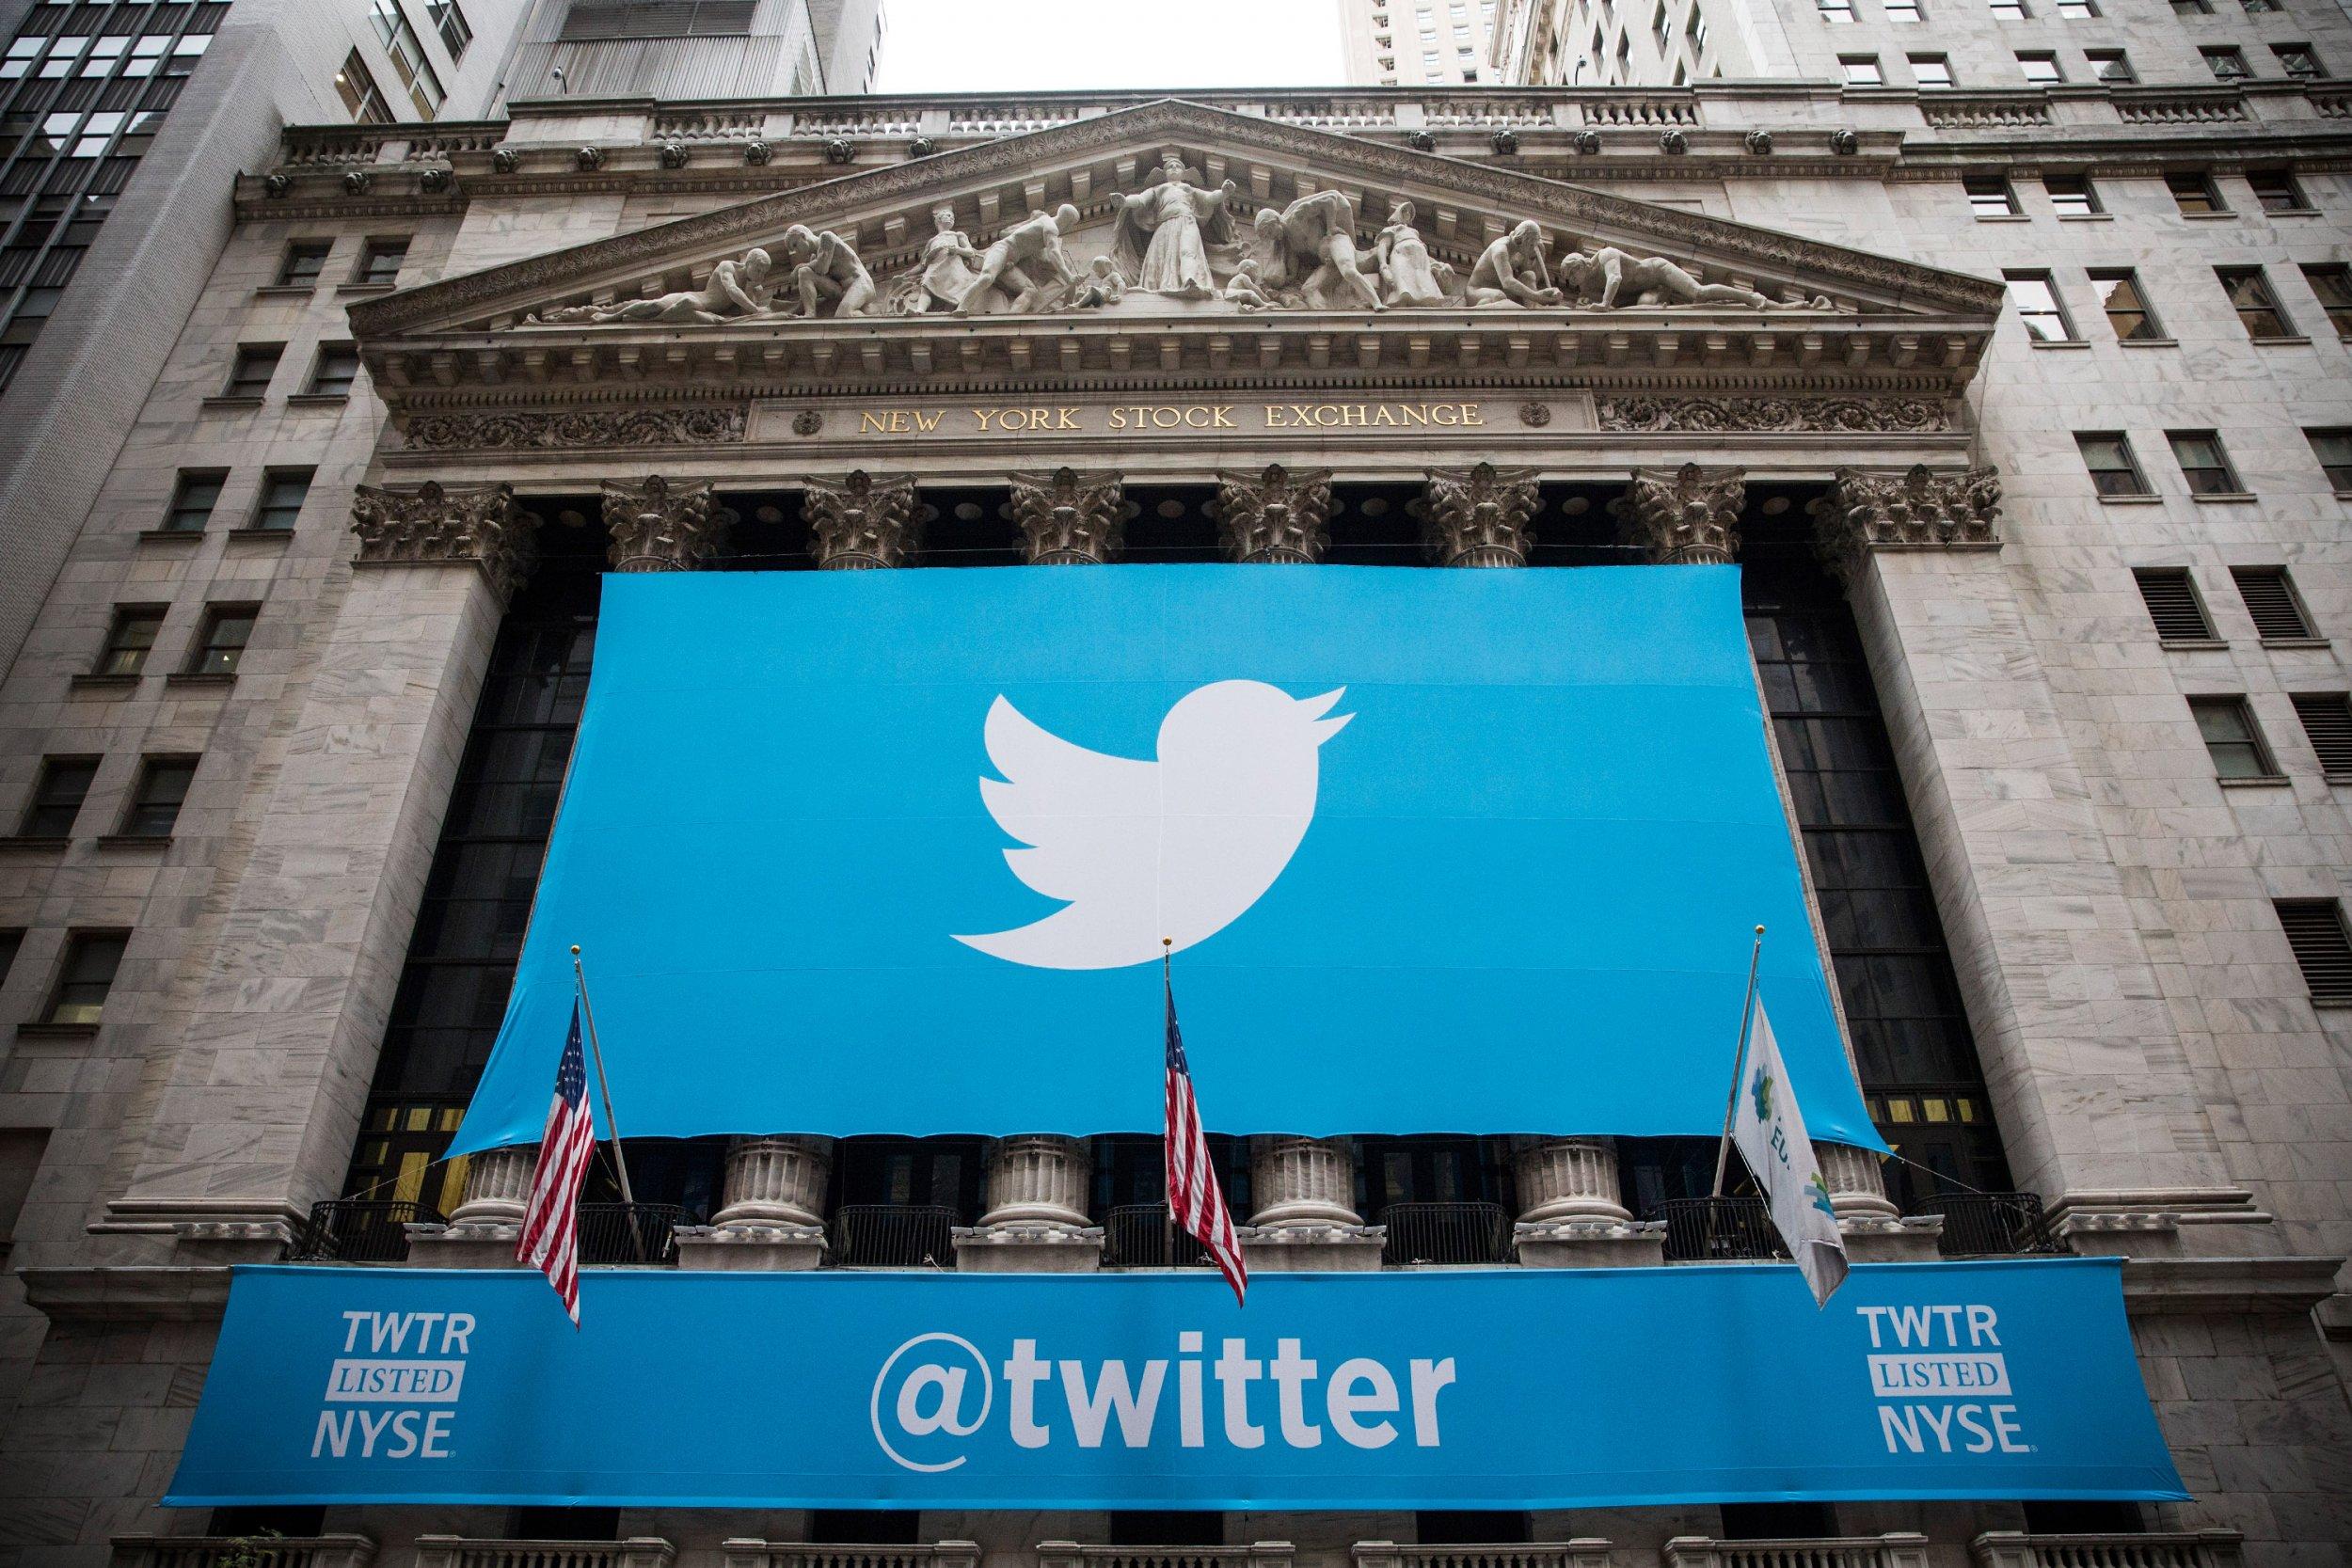 Twitter stock market